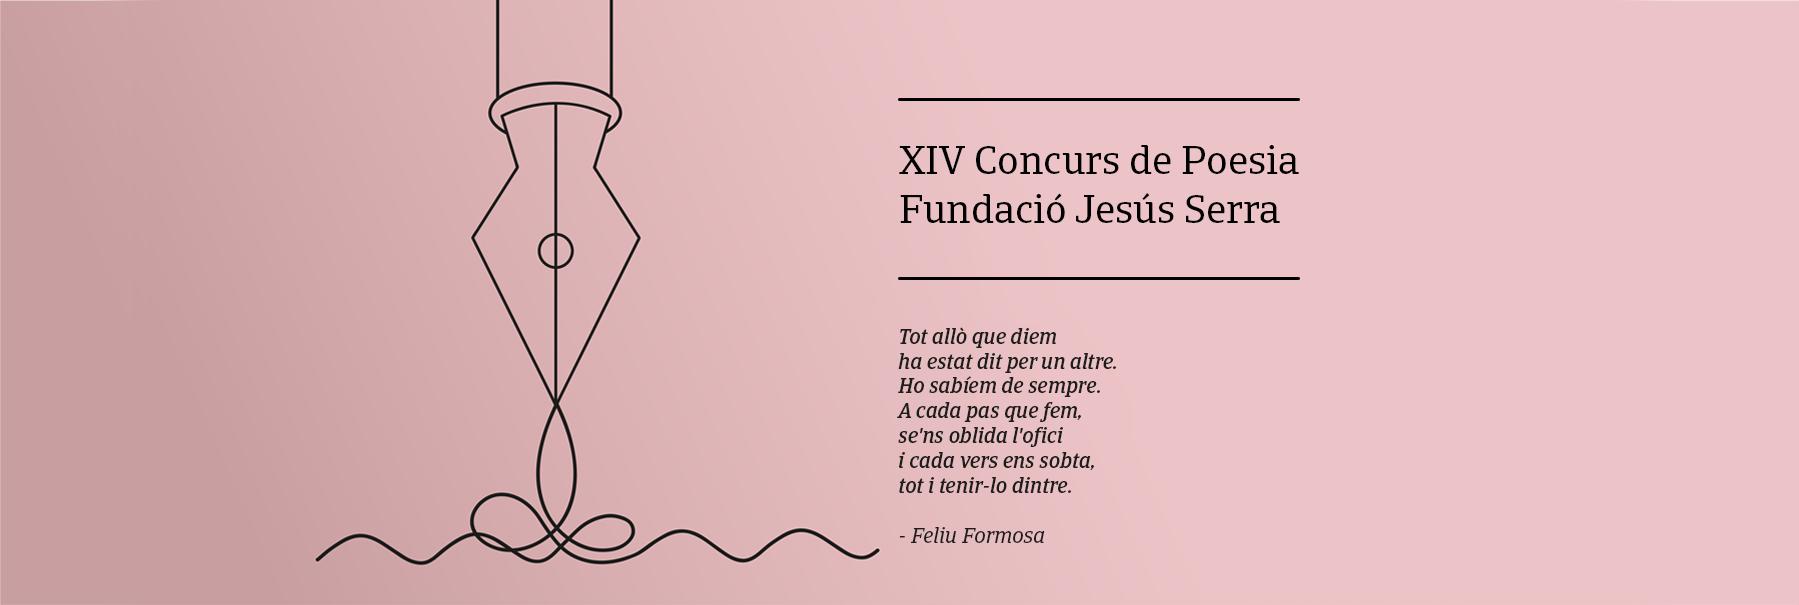 Concurs Poesia 2020 Fundació Jesús Serra